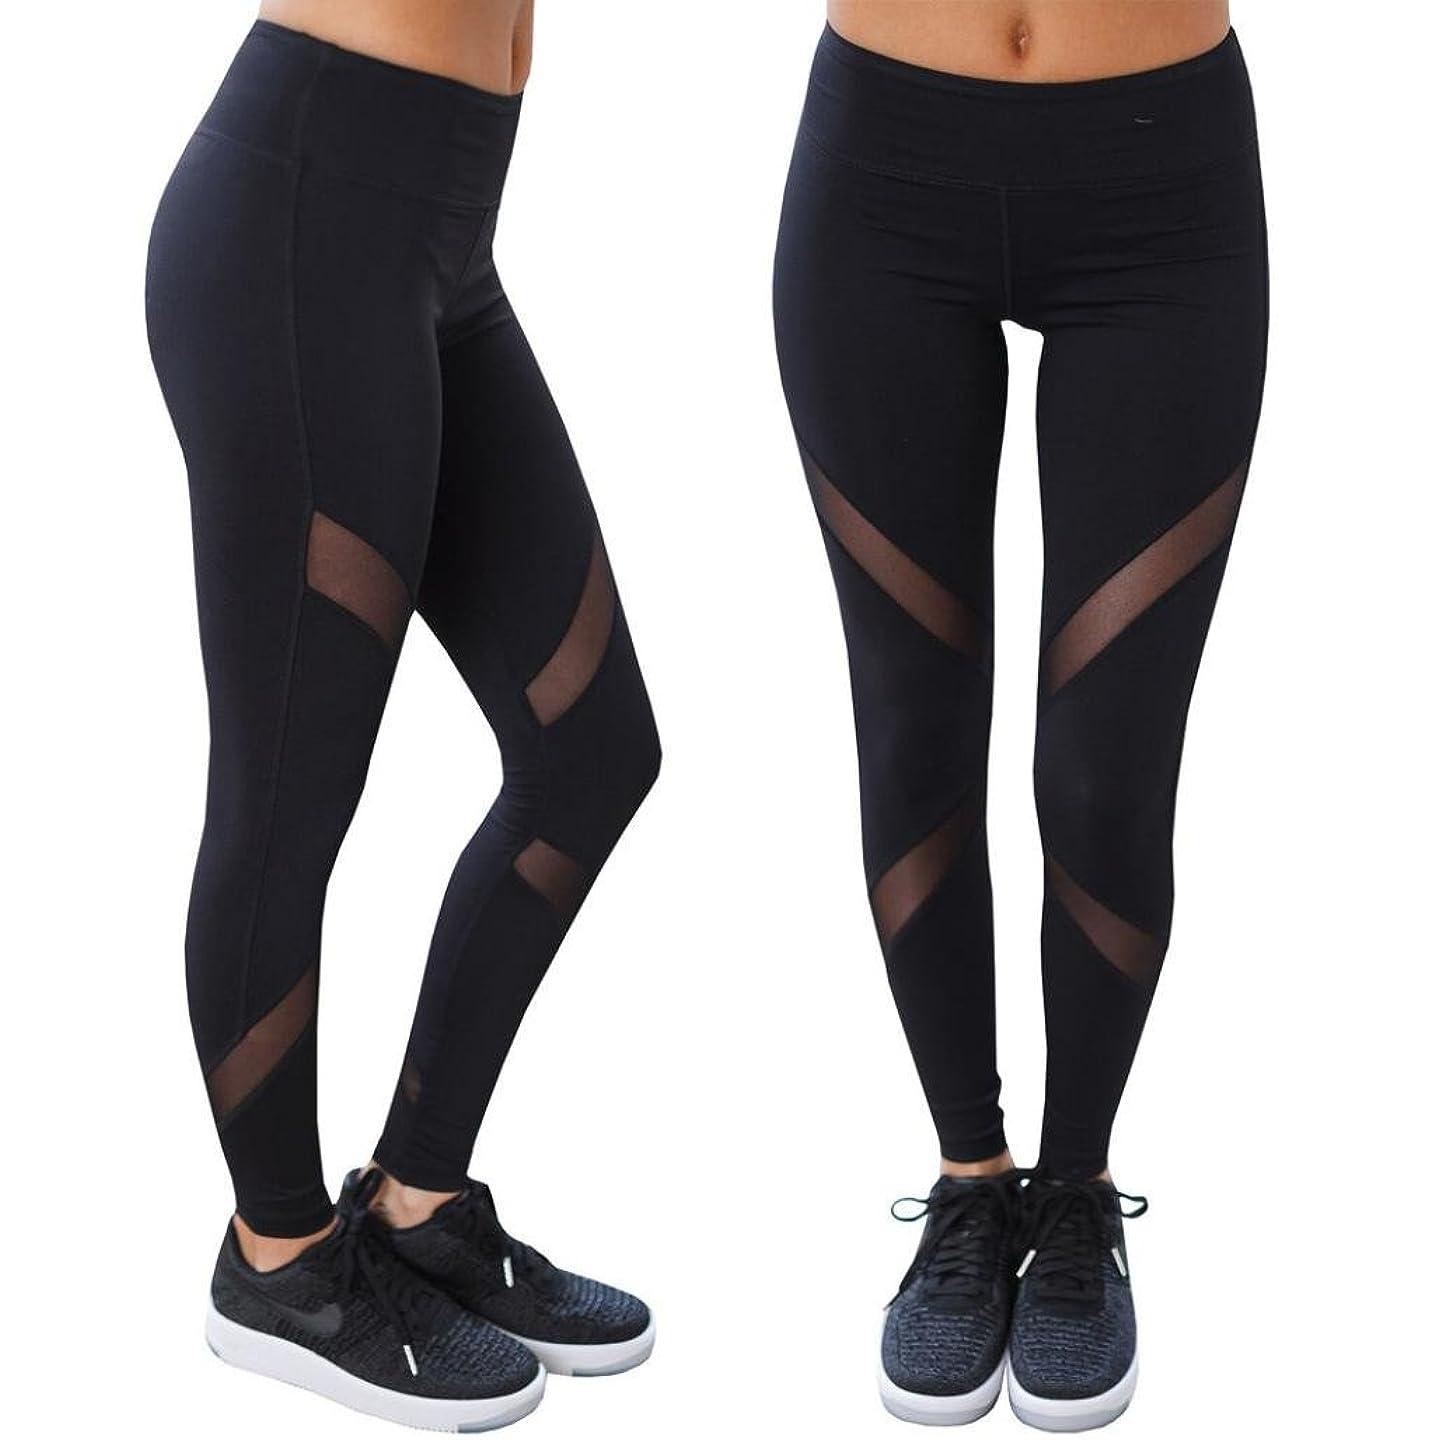 Yoga Pants, OOEOO Women High Waist Skinny Leggings Patchwork Mesh Push up Tight Trousers